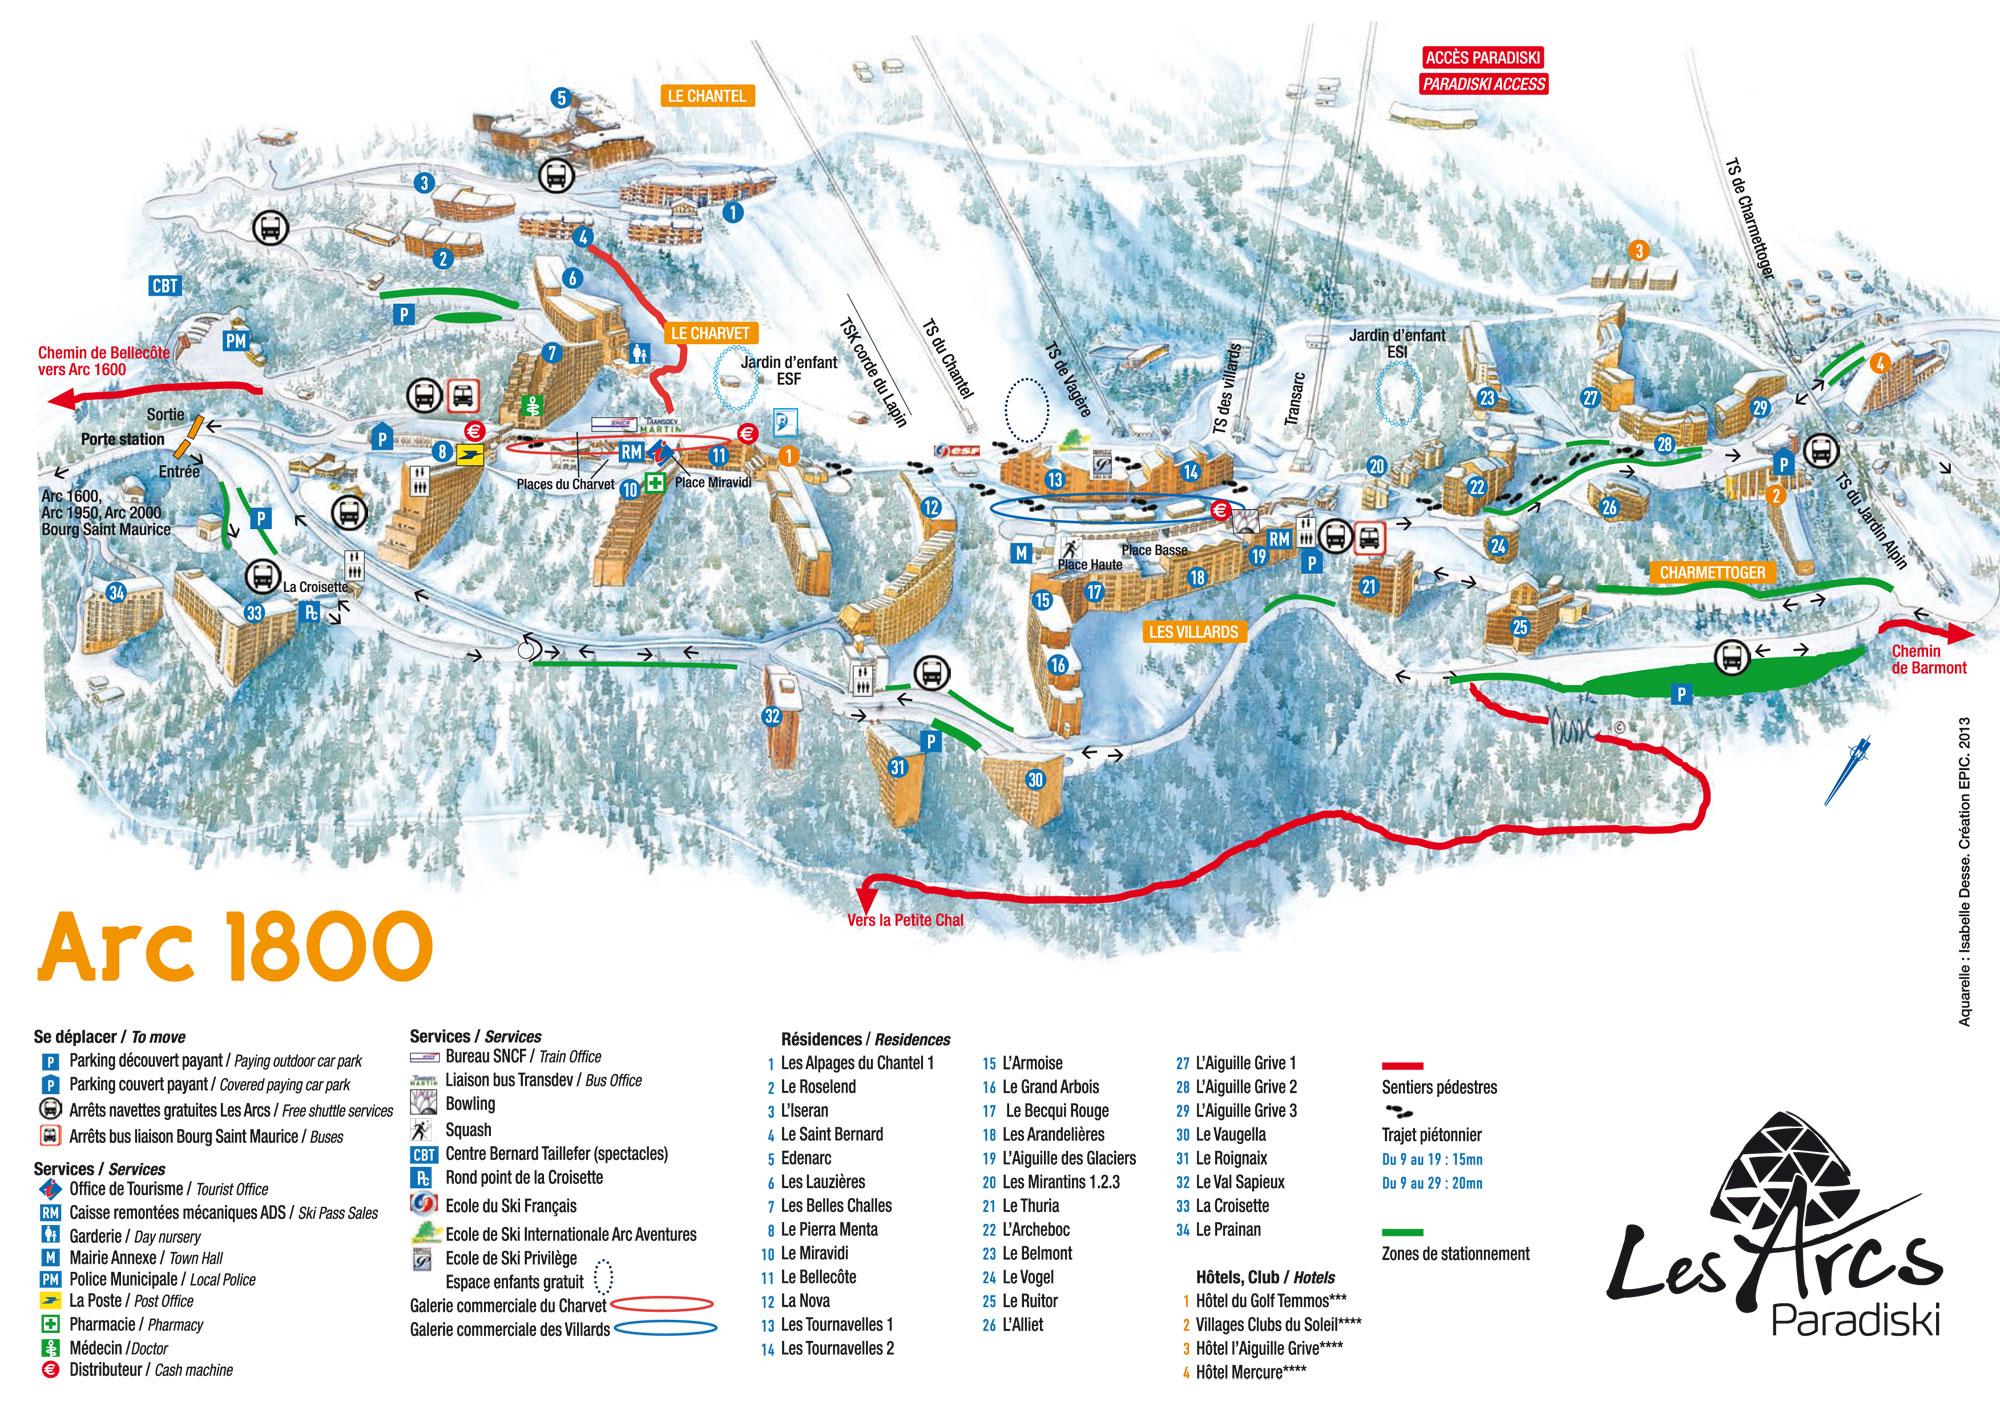 Residence Edenarc Les Arcs location vacances ski Les Arcs SkiPlanet